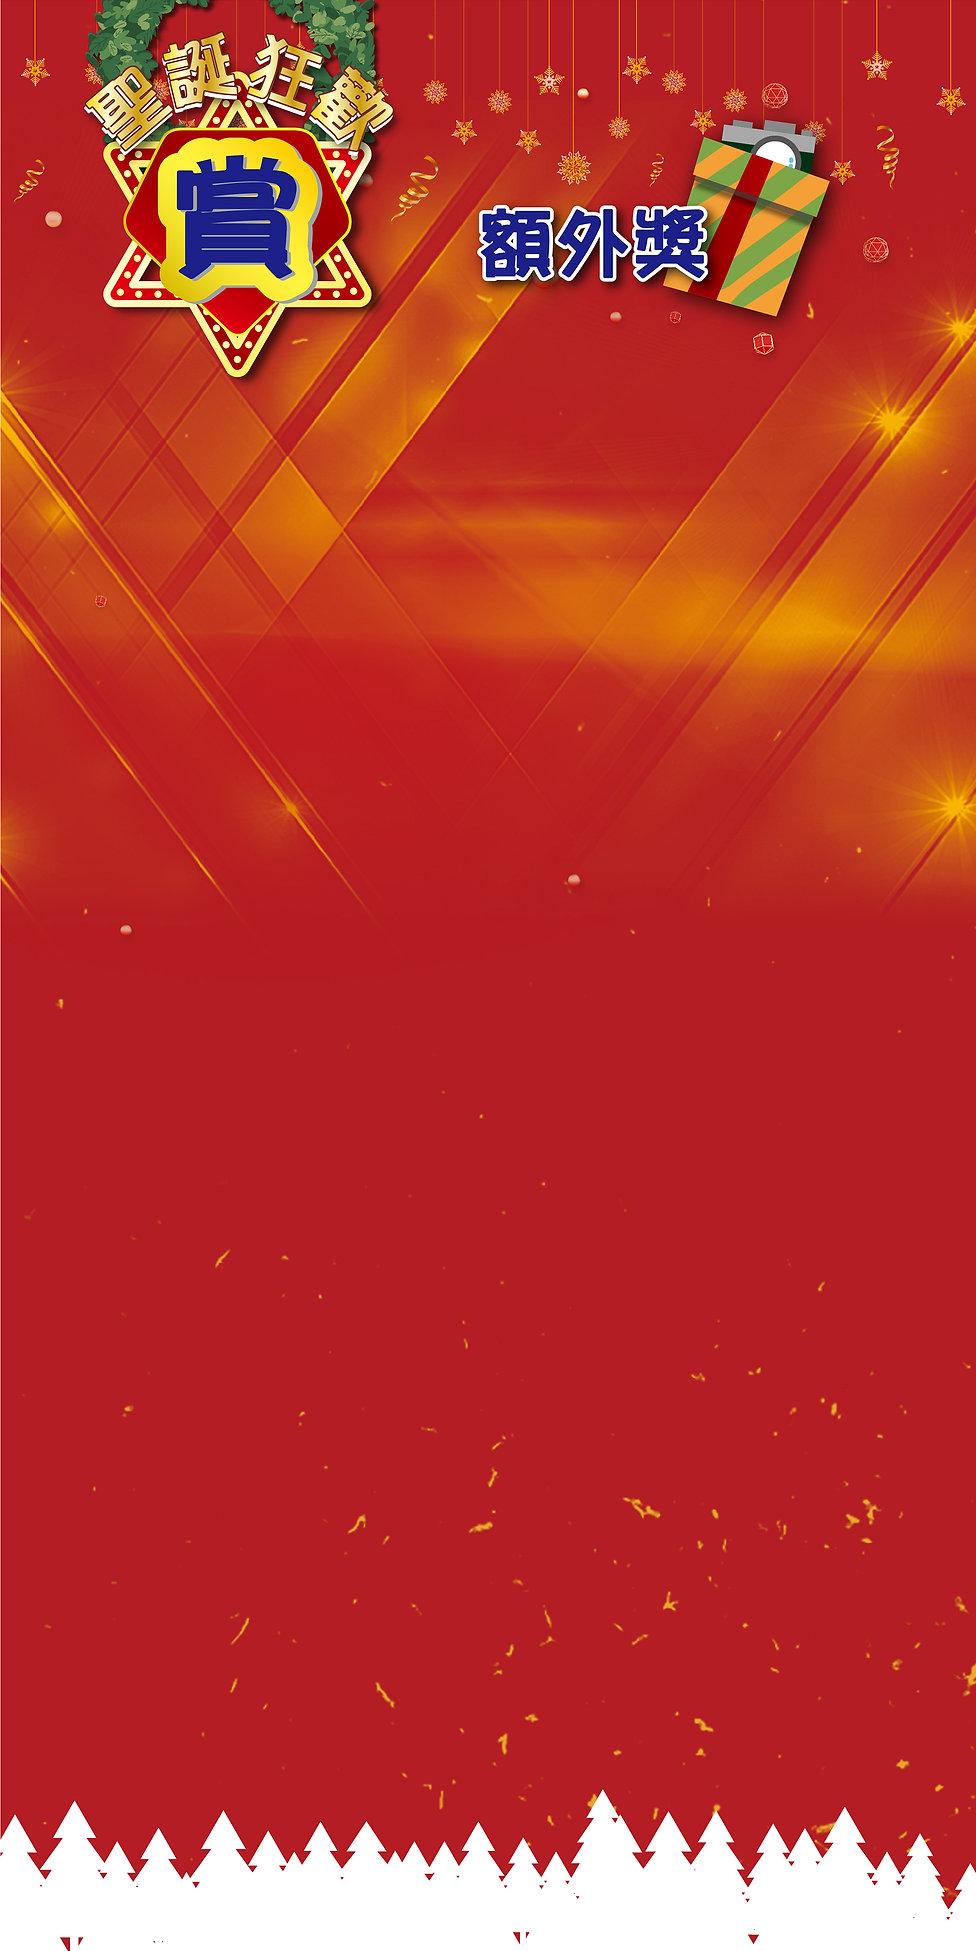 oncc vertical 1920x3840-01-01.jpg